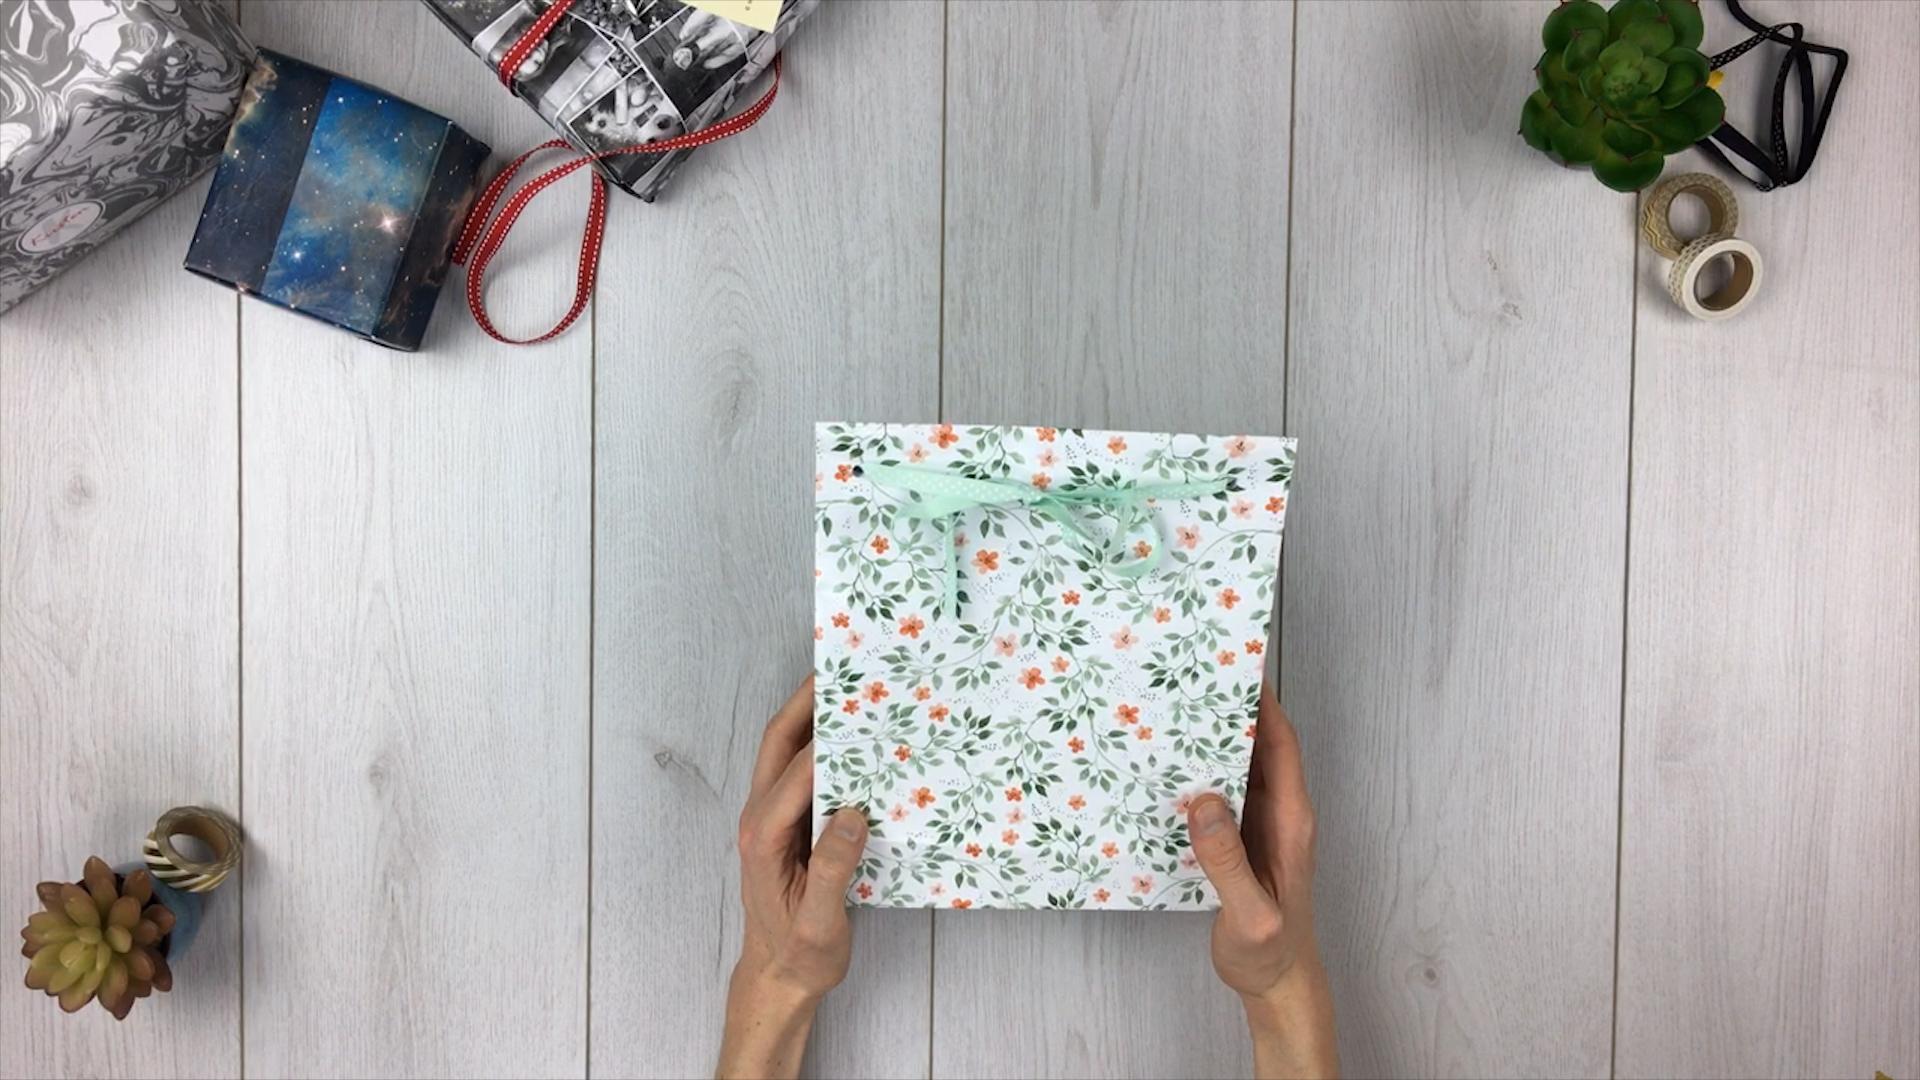 Geschenktüte basteln - Schritt 13